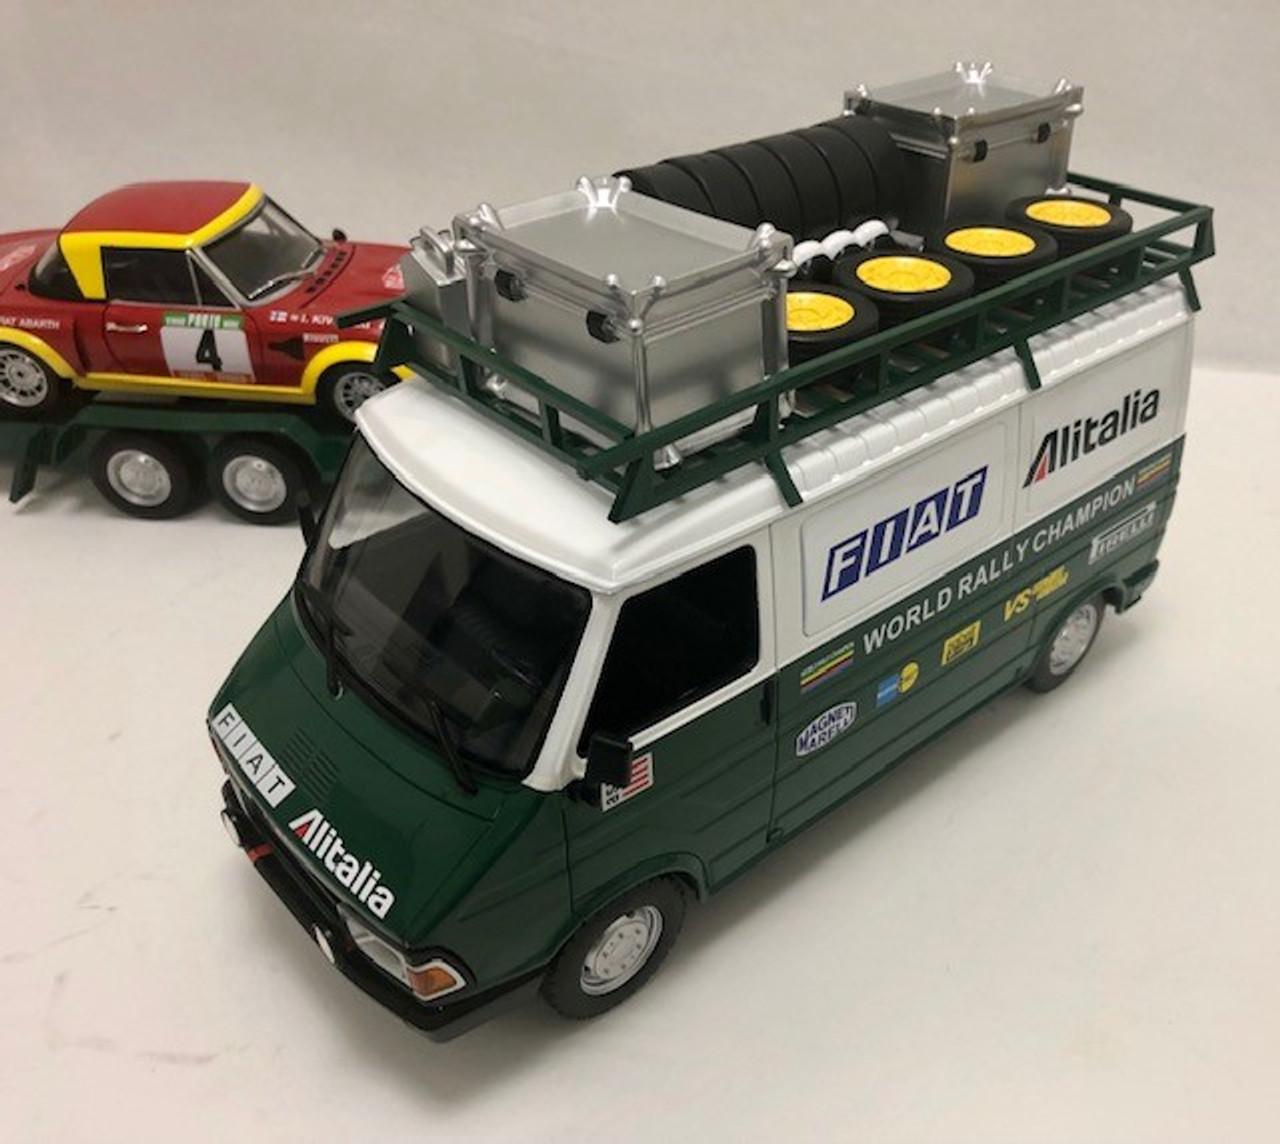 IXO 1:18 Fiat ducato 242 Van w/ Trailer and Fiat 124 Abarth Race Car: Alitalia Rally Team